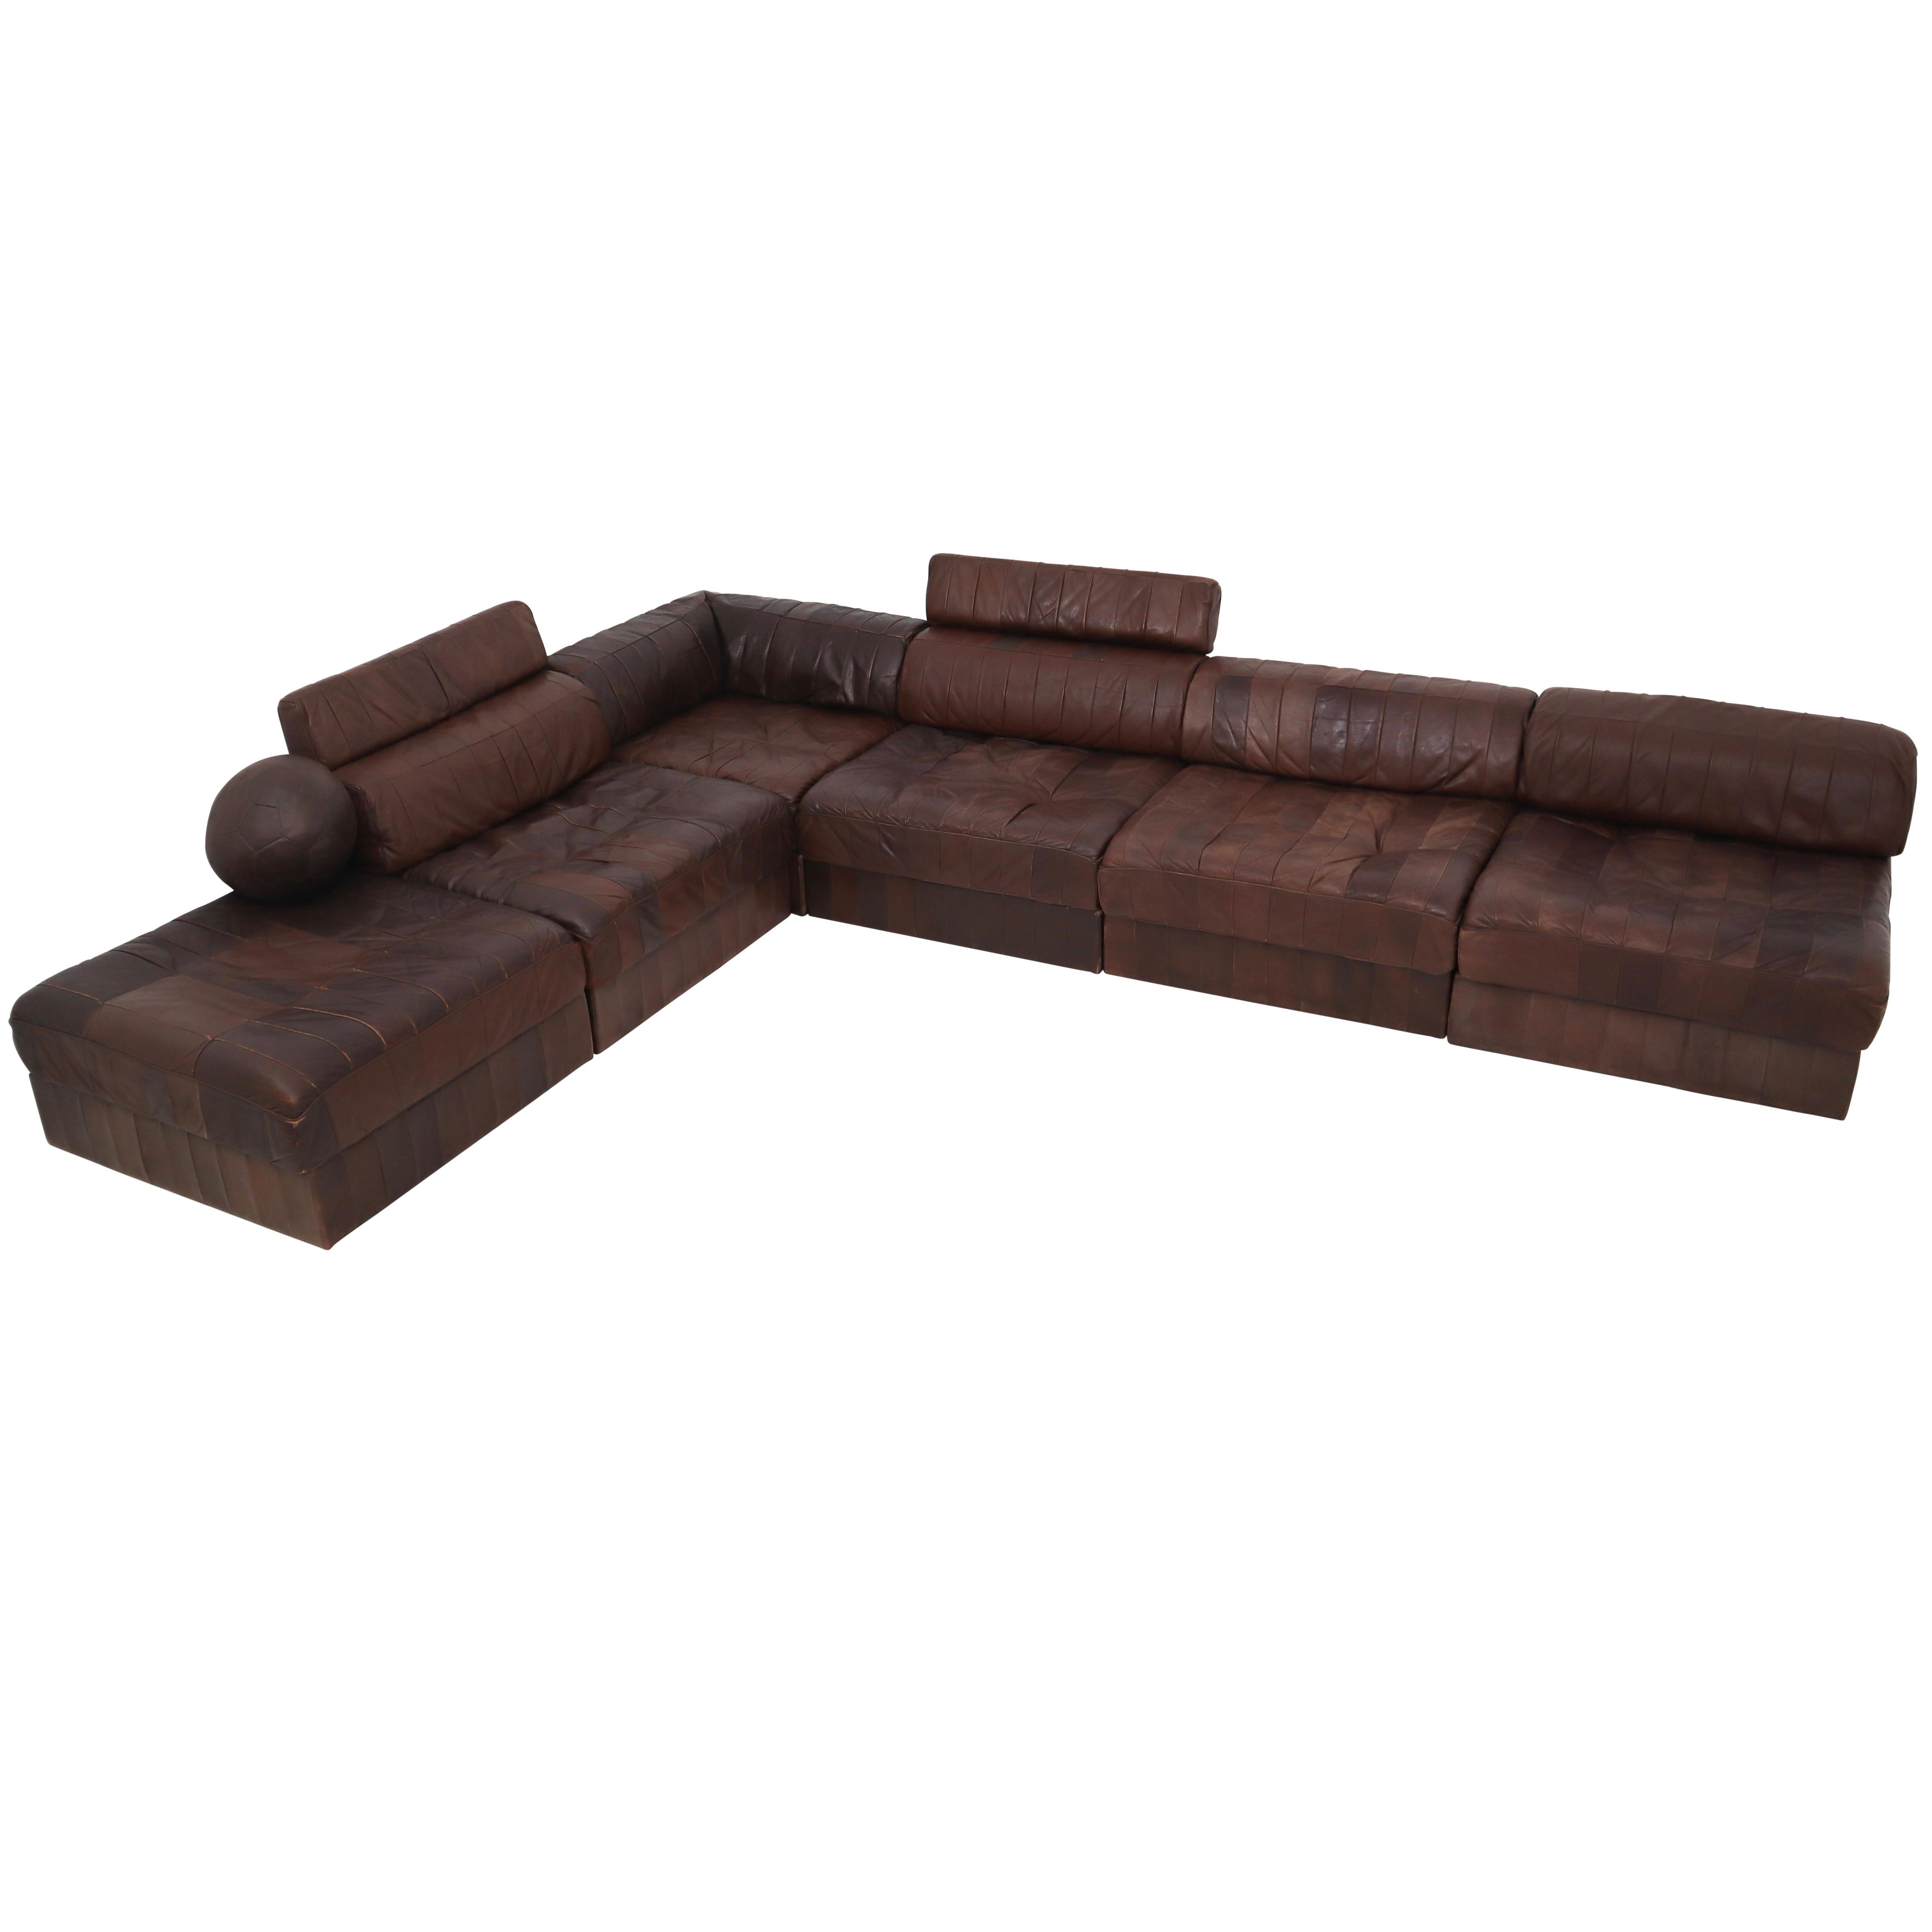 DS88 Modular Brown Cognac Leather Patchwork Sofa For De Sede, Switzerland